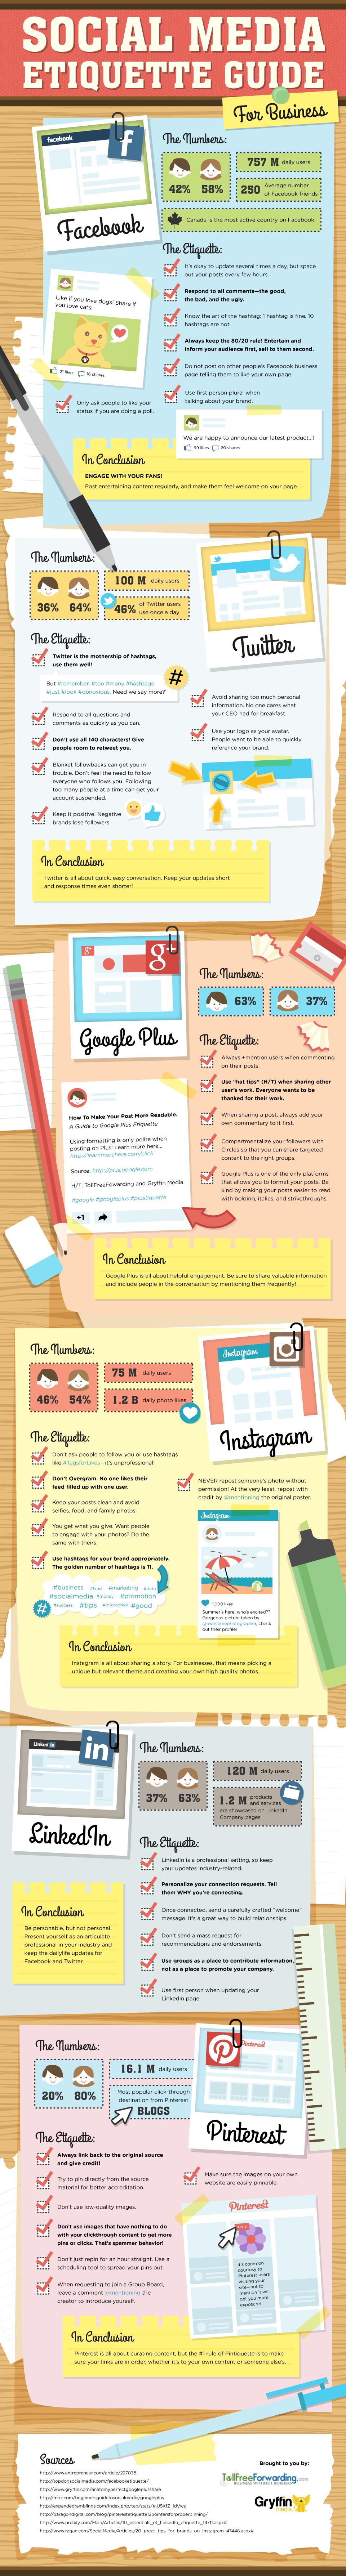 Infographic_Social_Media_Etiquette